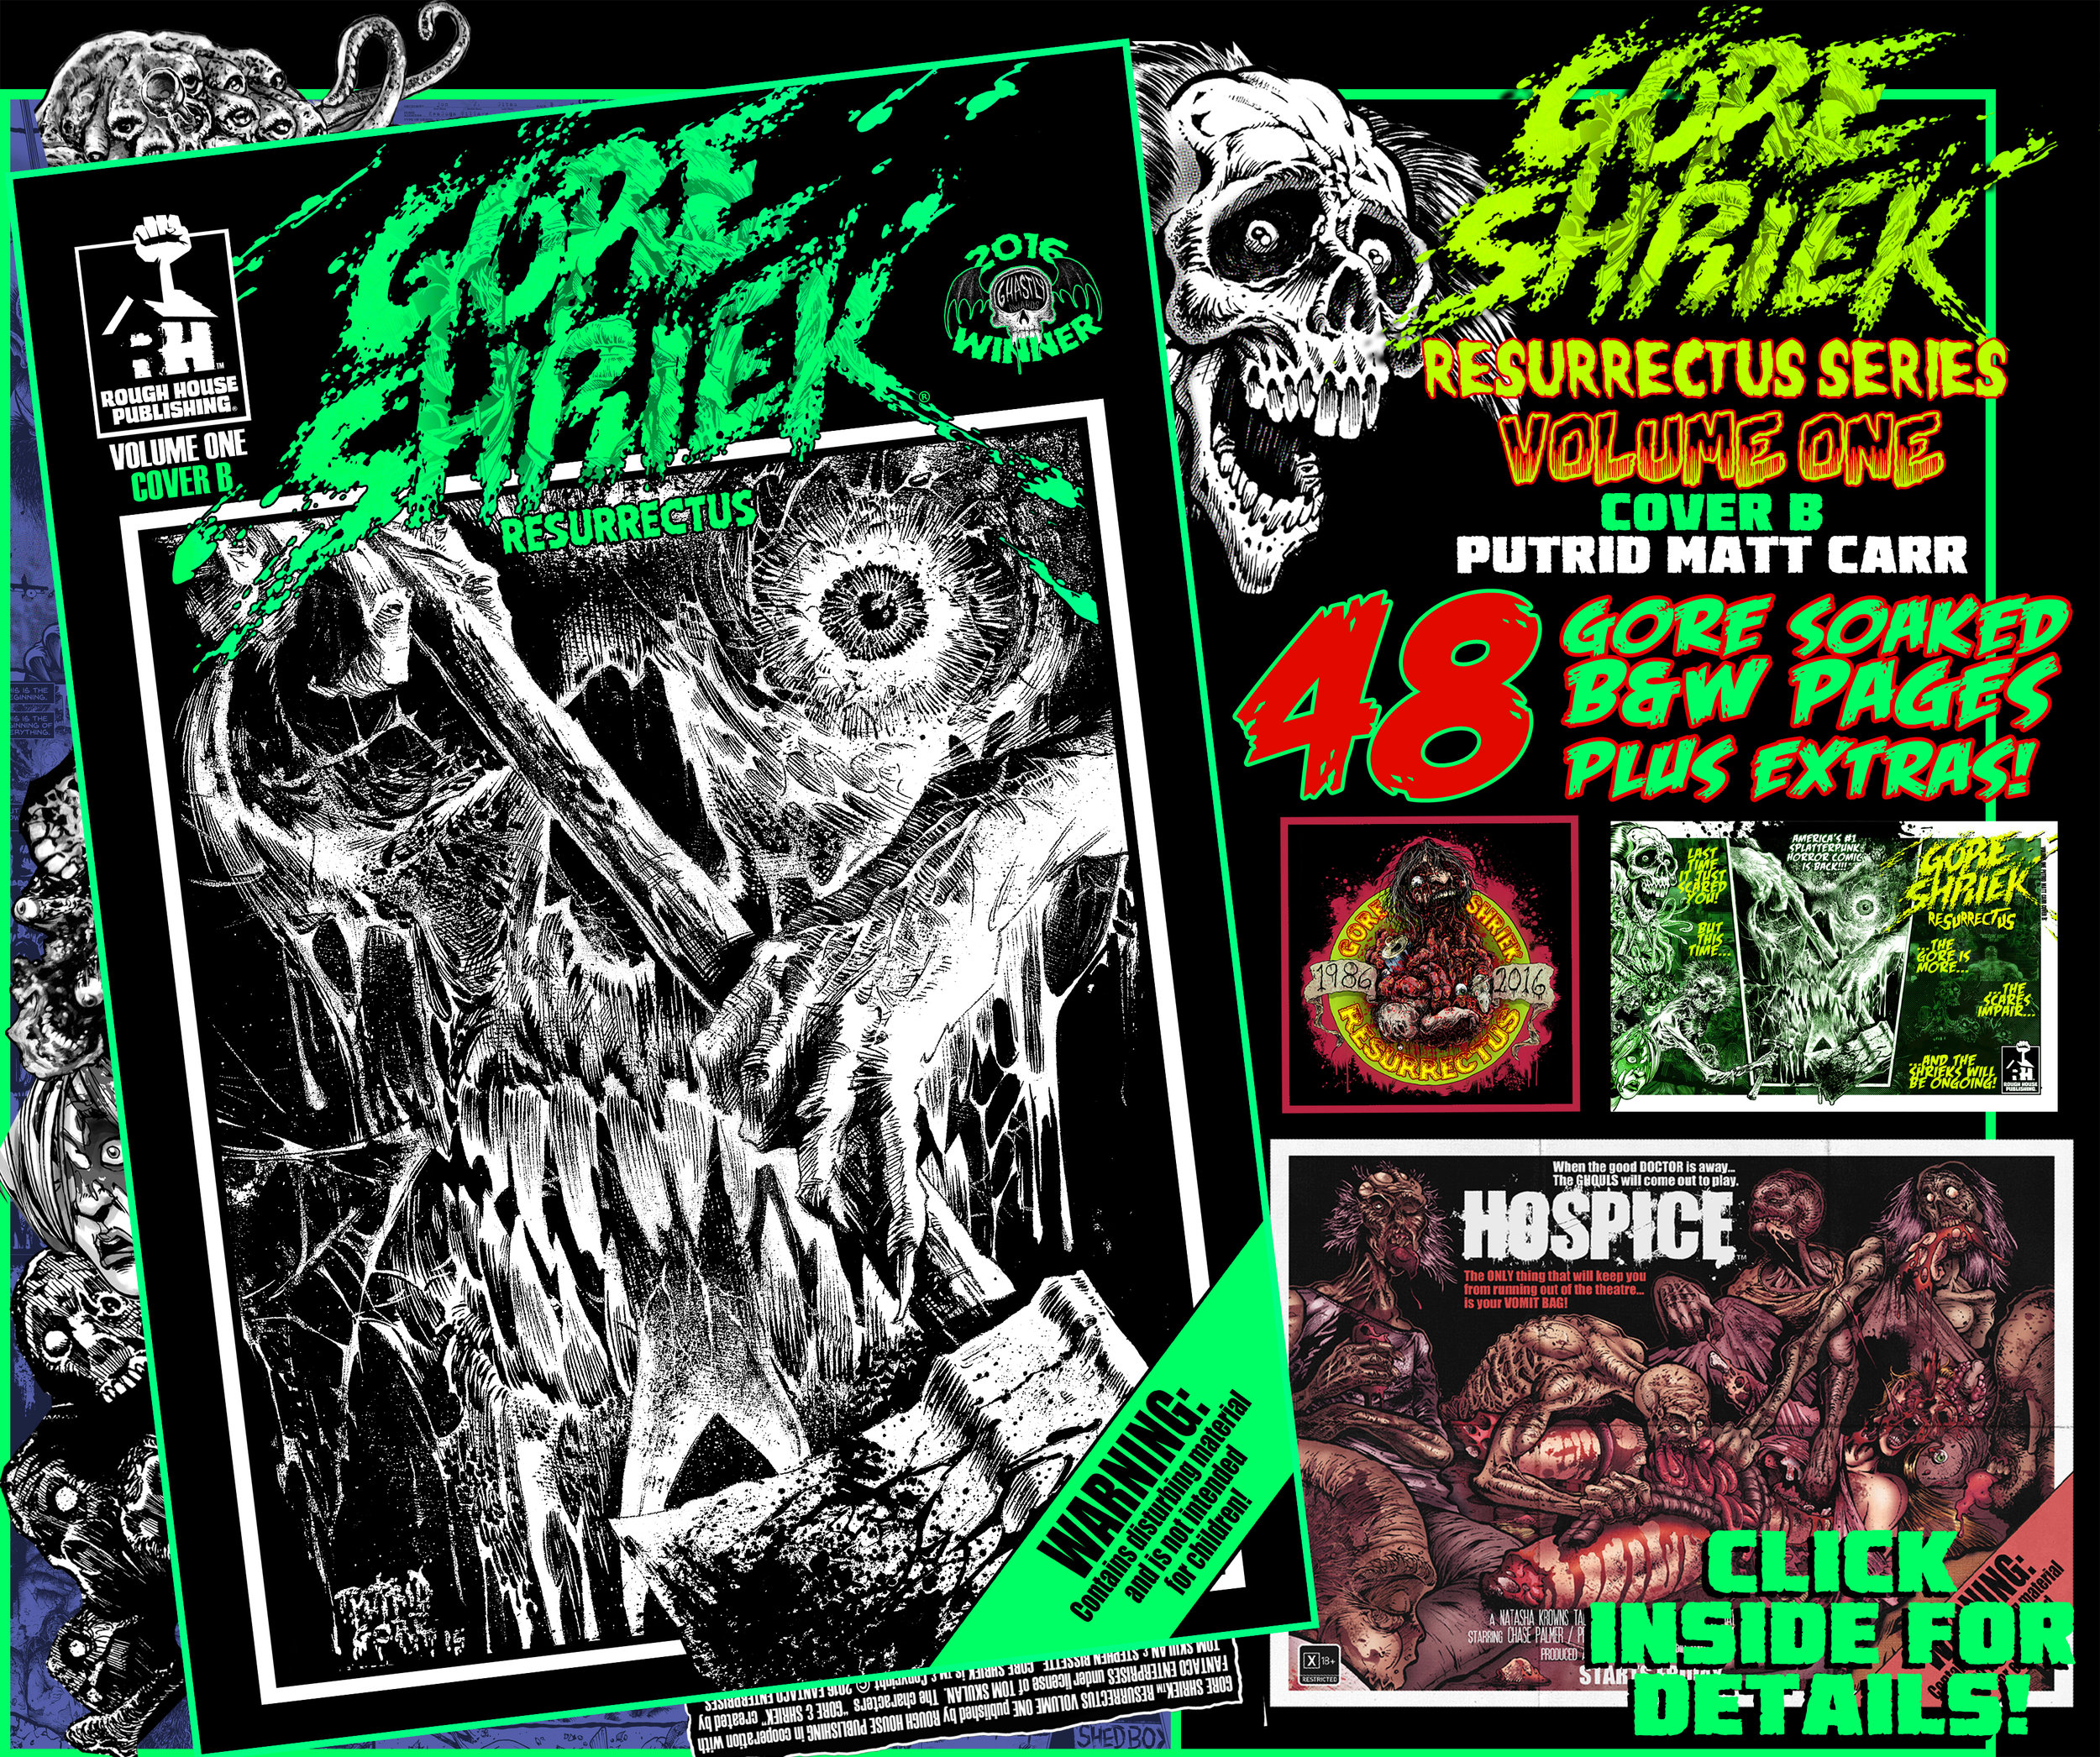 Gore Shriek Resurrectus Volume One Cover B Putrid Matt Carr Rough House Publishing